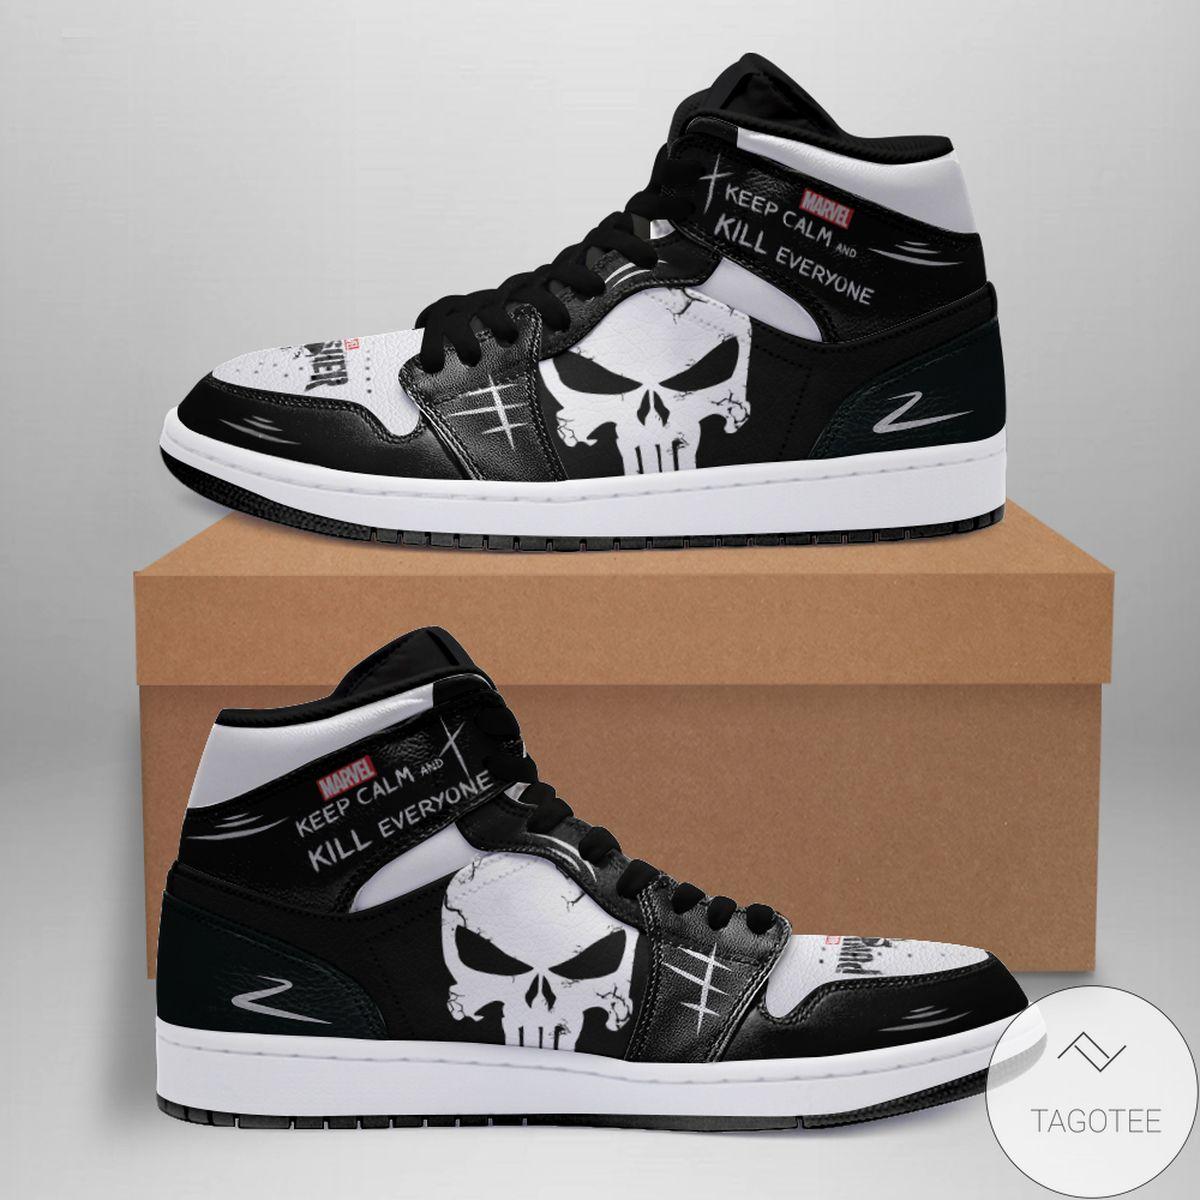 Personalized Punisher Air Jordan 13